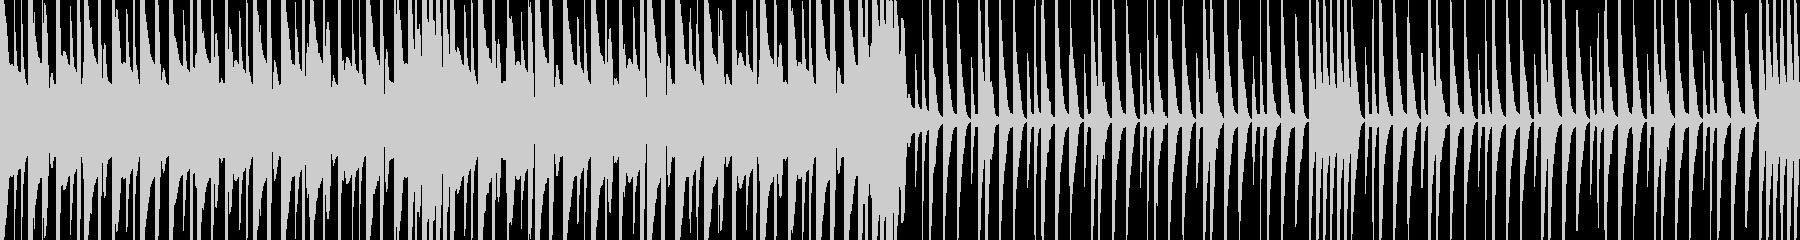 【Loop】Acid beatの未再生の波形